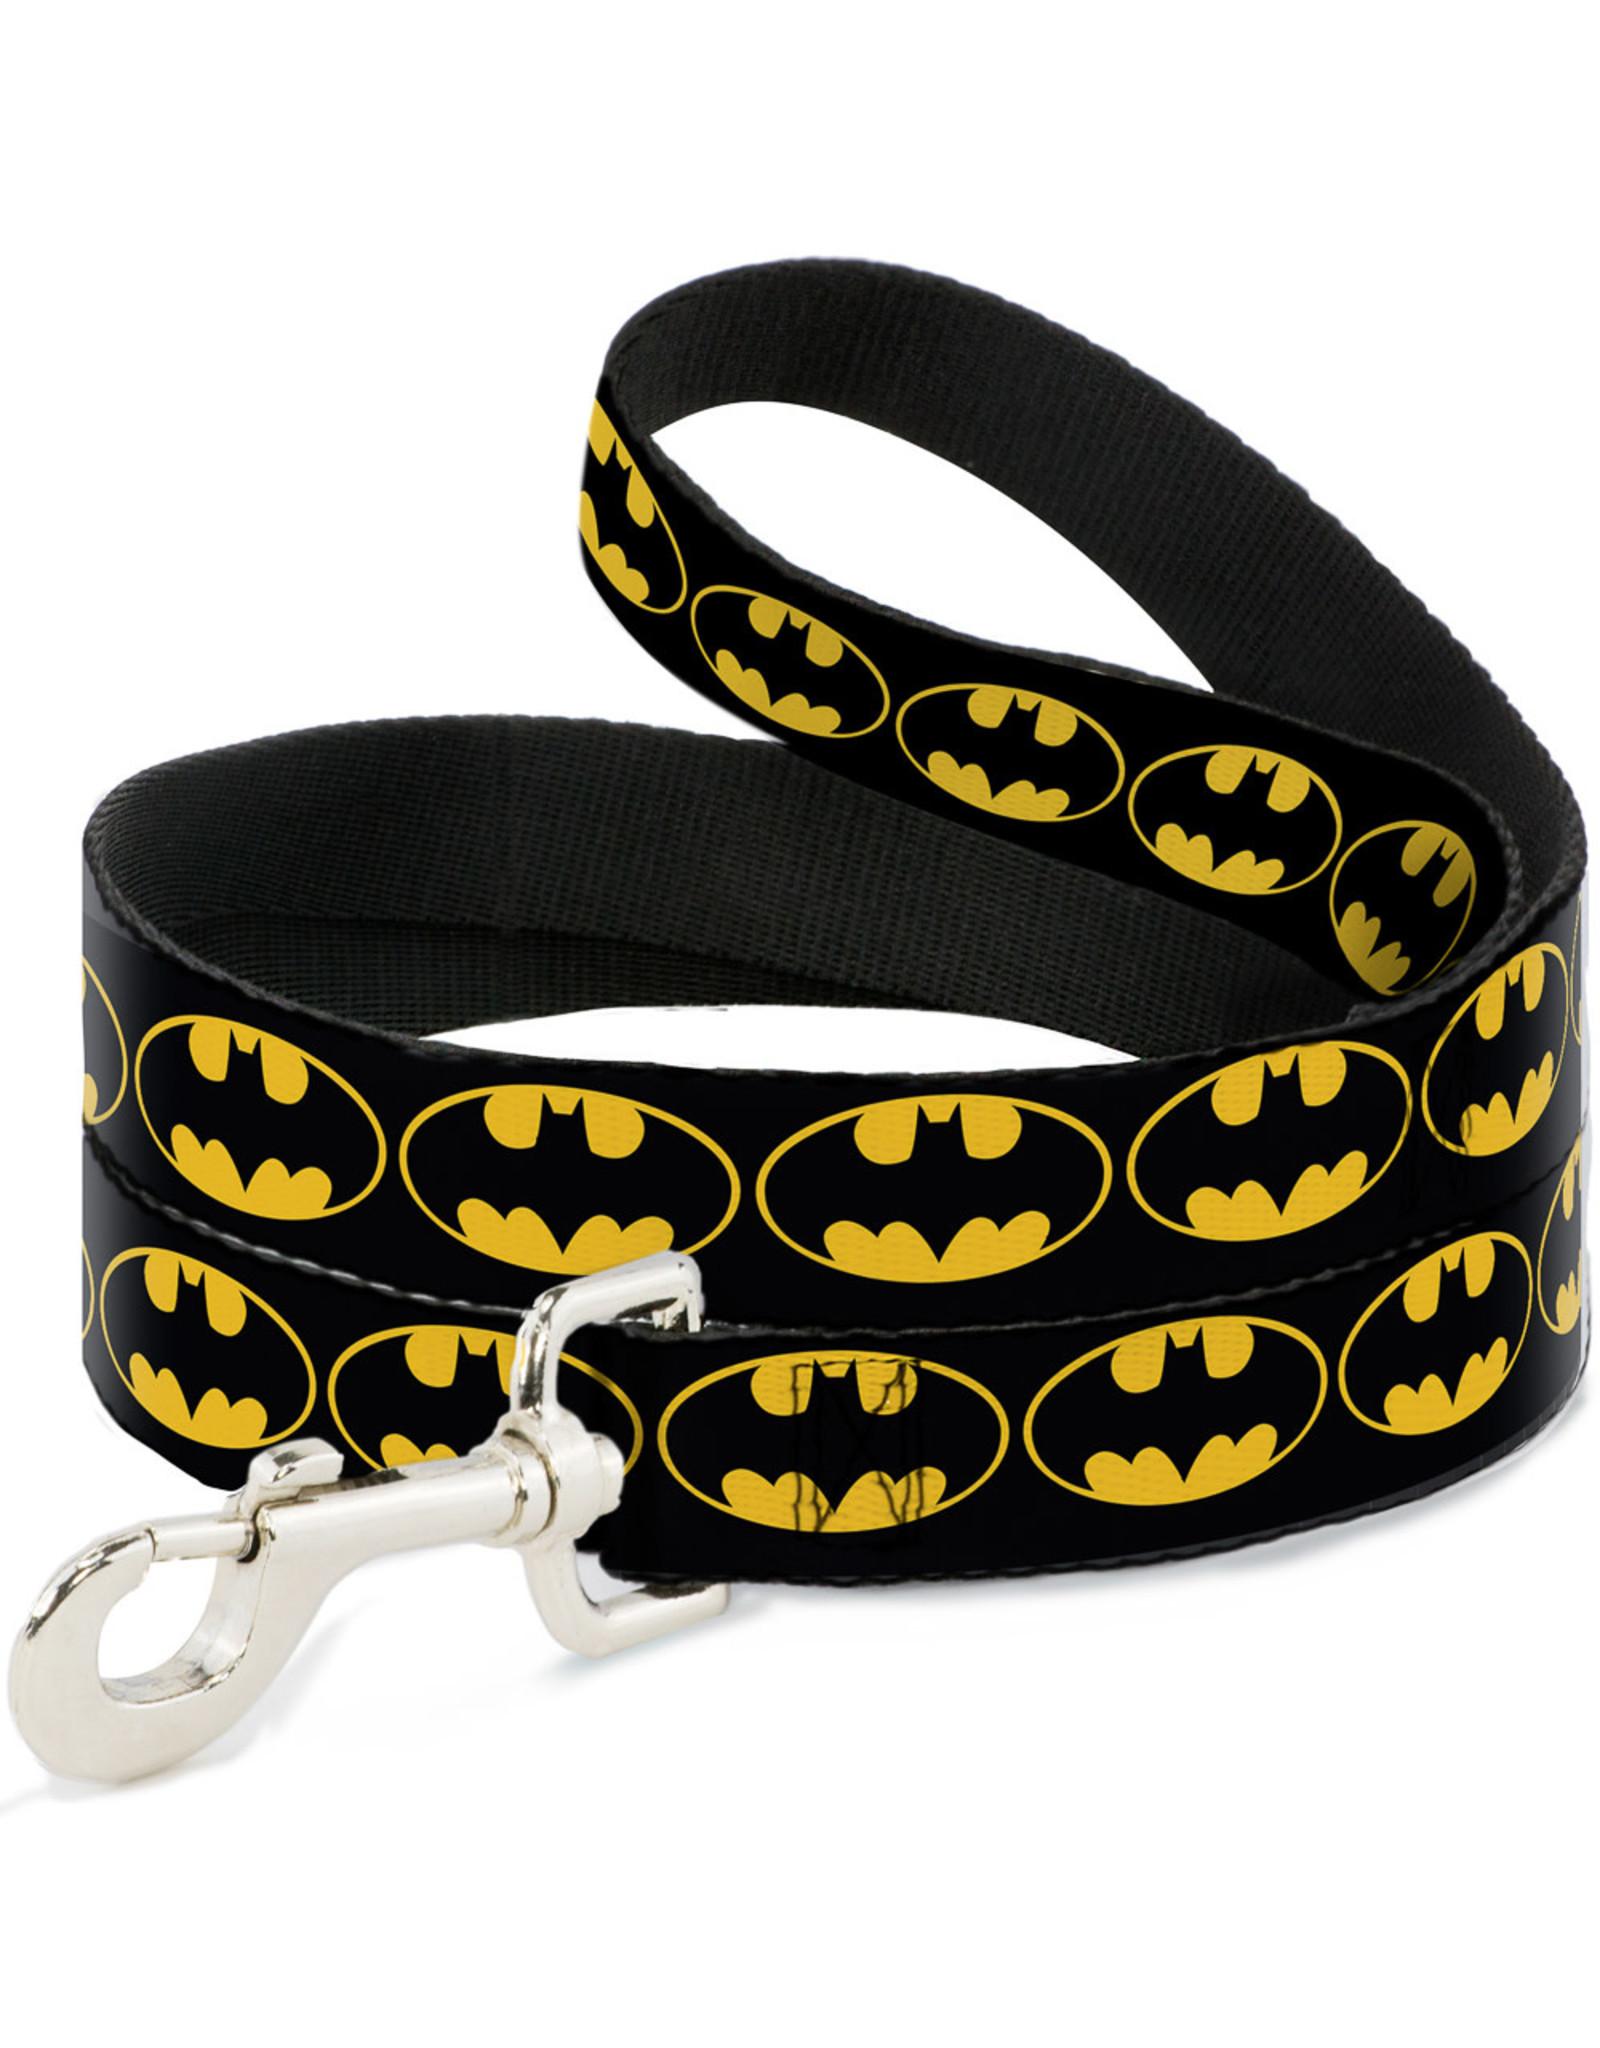 BATMAN Dog Leash 1,2 M - 2,5 Cm - Black/Logo